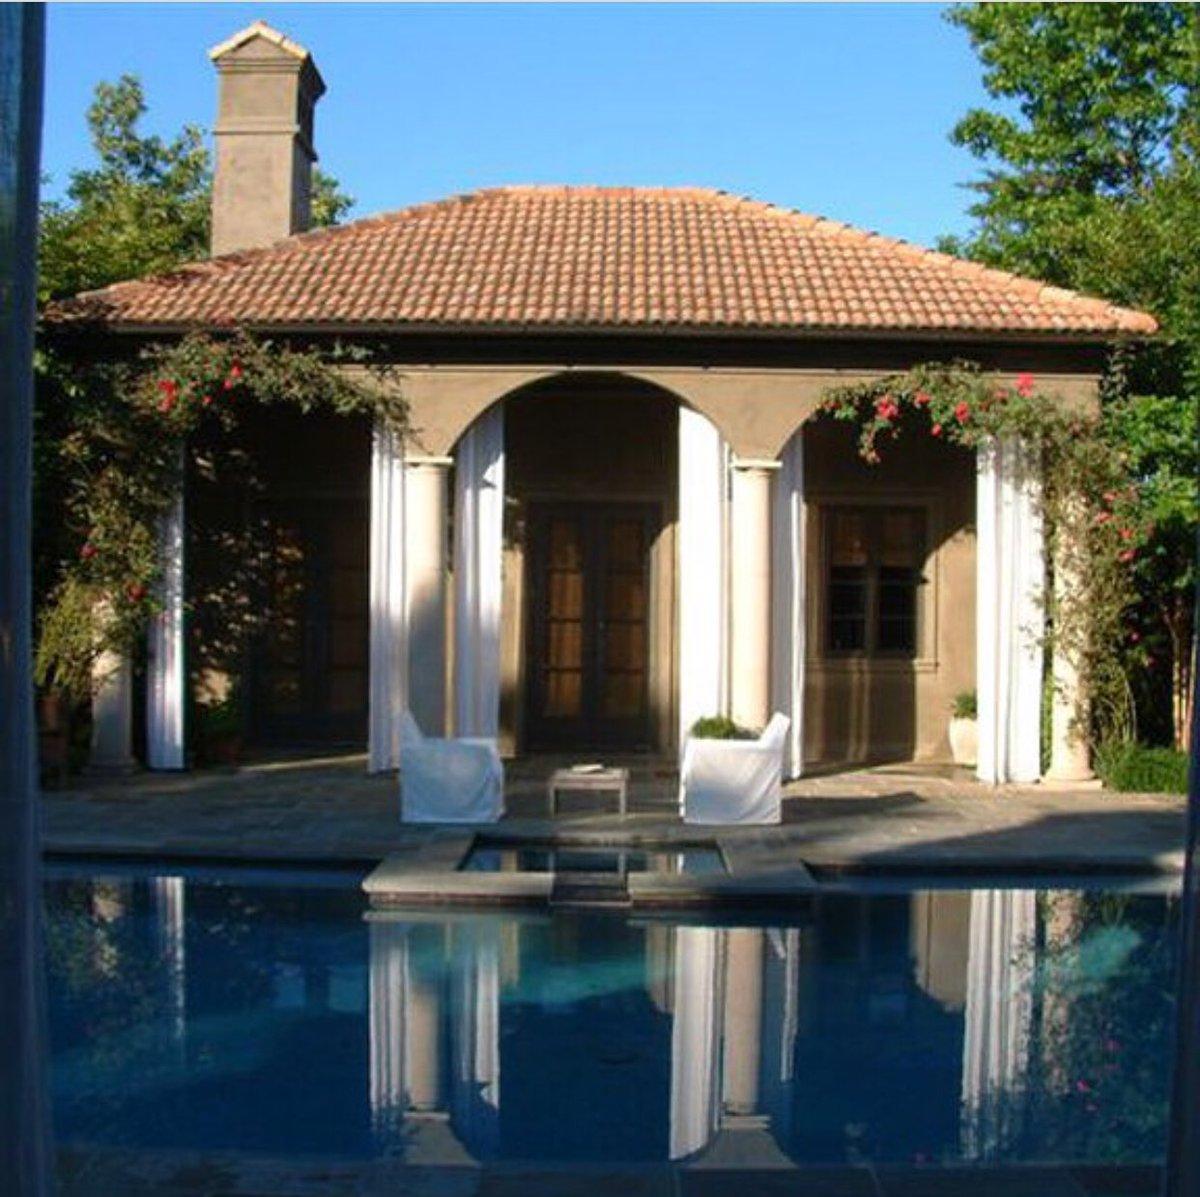 This Mediterranean stucco house by Spitzmiller & Norris.  A Pool( photo)  House mirrors the loggia and overlooks the garden beyond.   #spitzmillerandnorris #medierraneanvilla #poolweather #atlantaarchitects #residentialdesigners    https://www. spitzmillerandnorris.com/mediterranean- villa  … <br>http://pic.twitter.com/ILiQEbz6i9